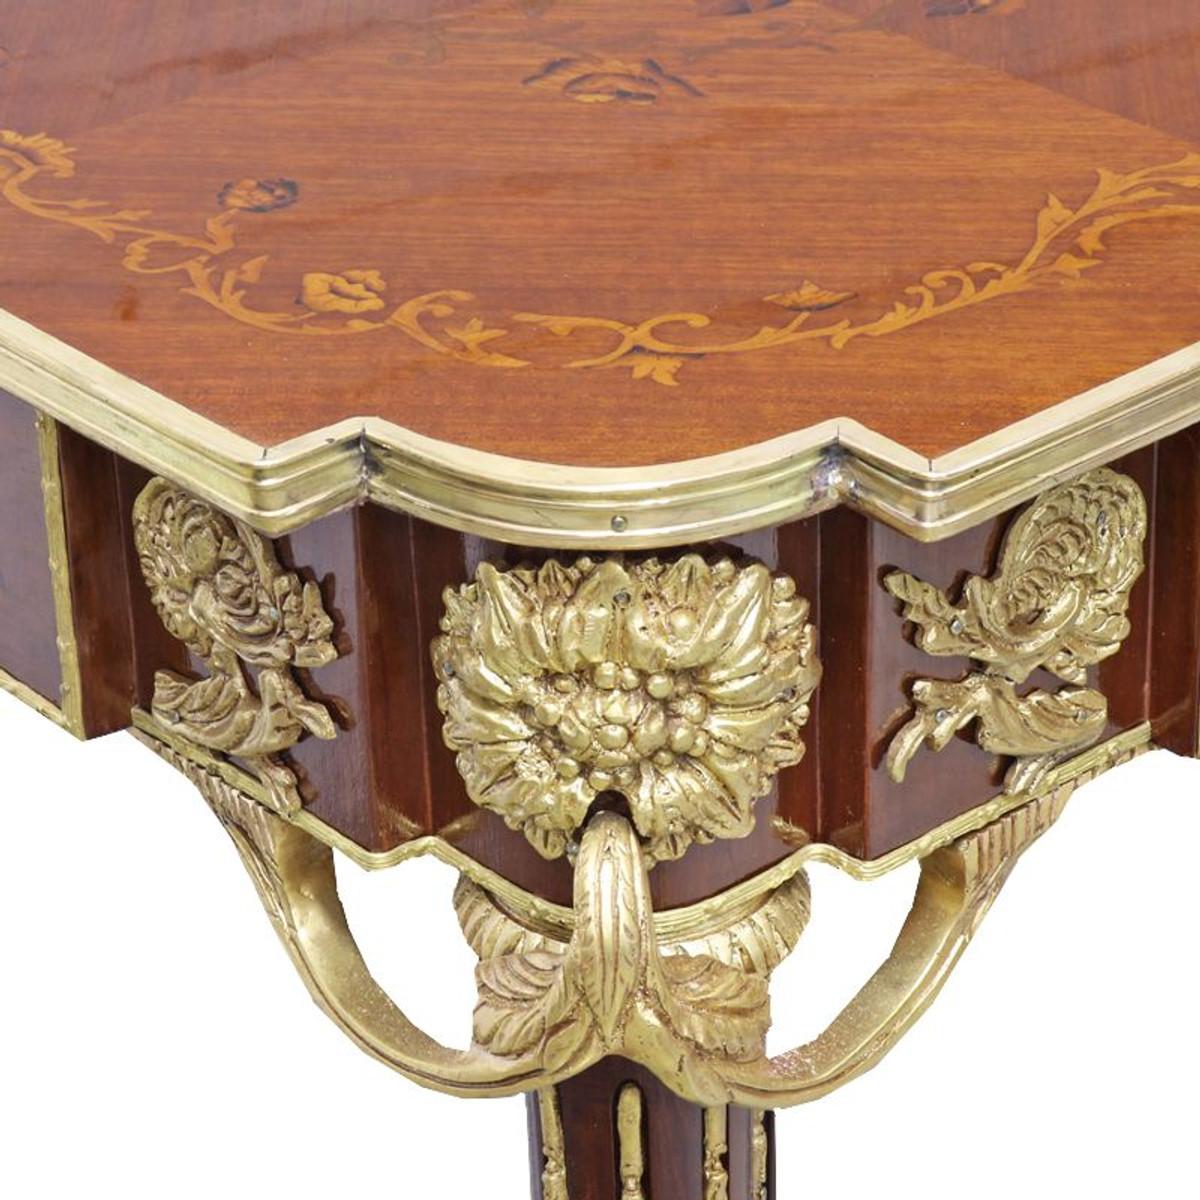 Casa Padrino Barock Beistelltisch Mahagoni Intarsien / Gold H75 x 50 cm - Ludwig XVI Antik Stil Tisch - Möbel 2